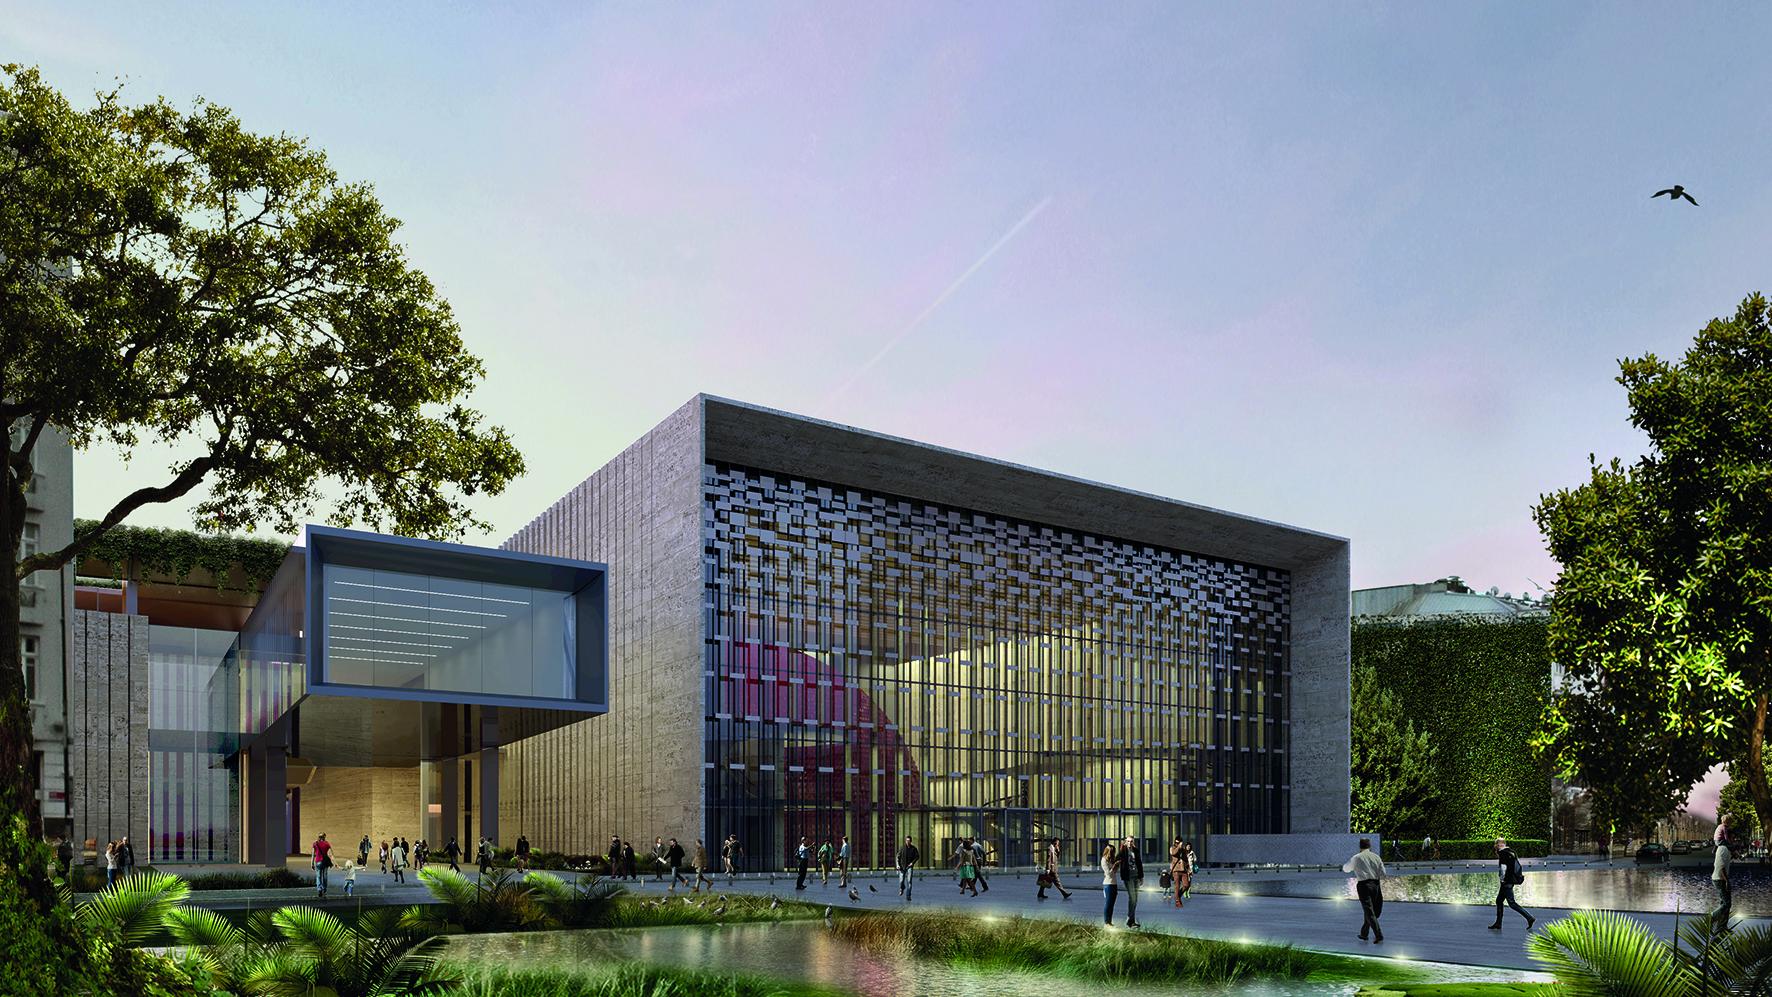 The new Ataturk Cultural Center designed by Murat Tabanlıoğlu